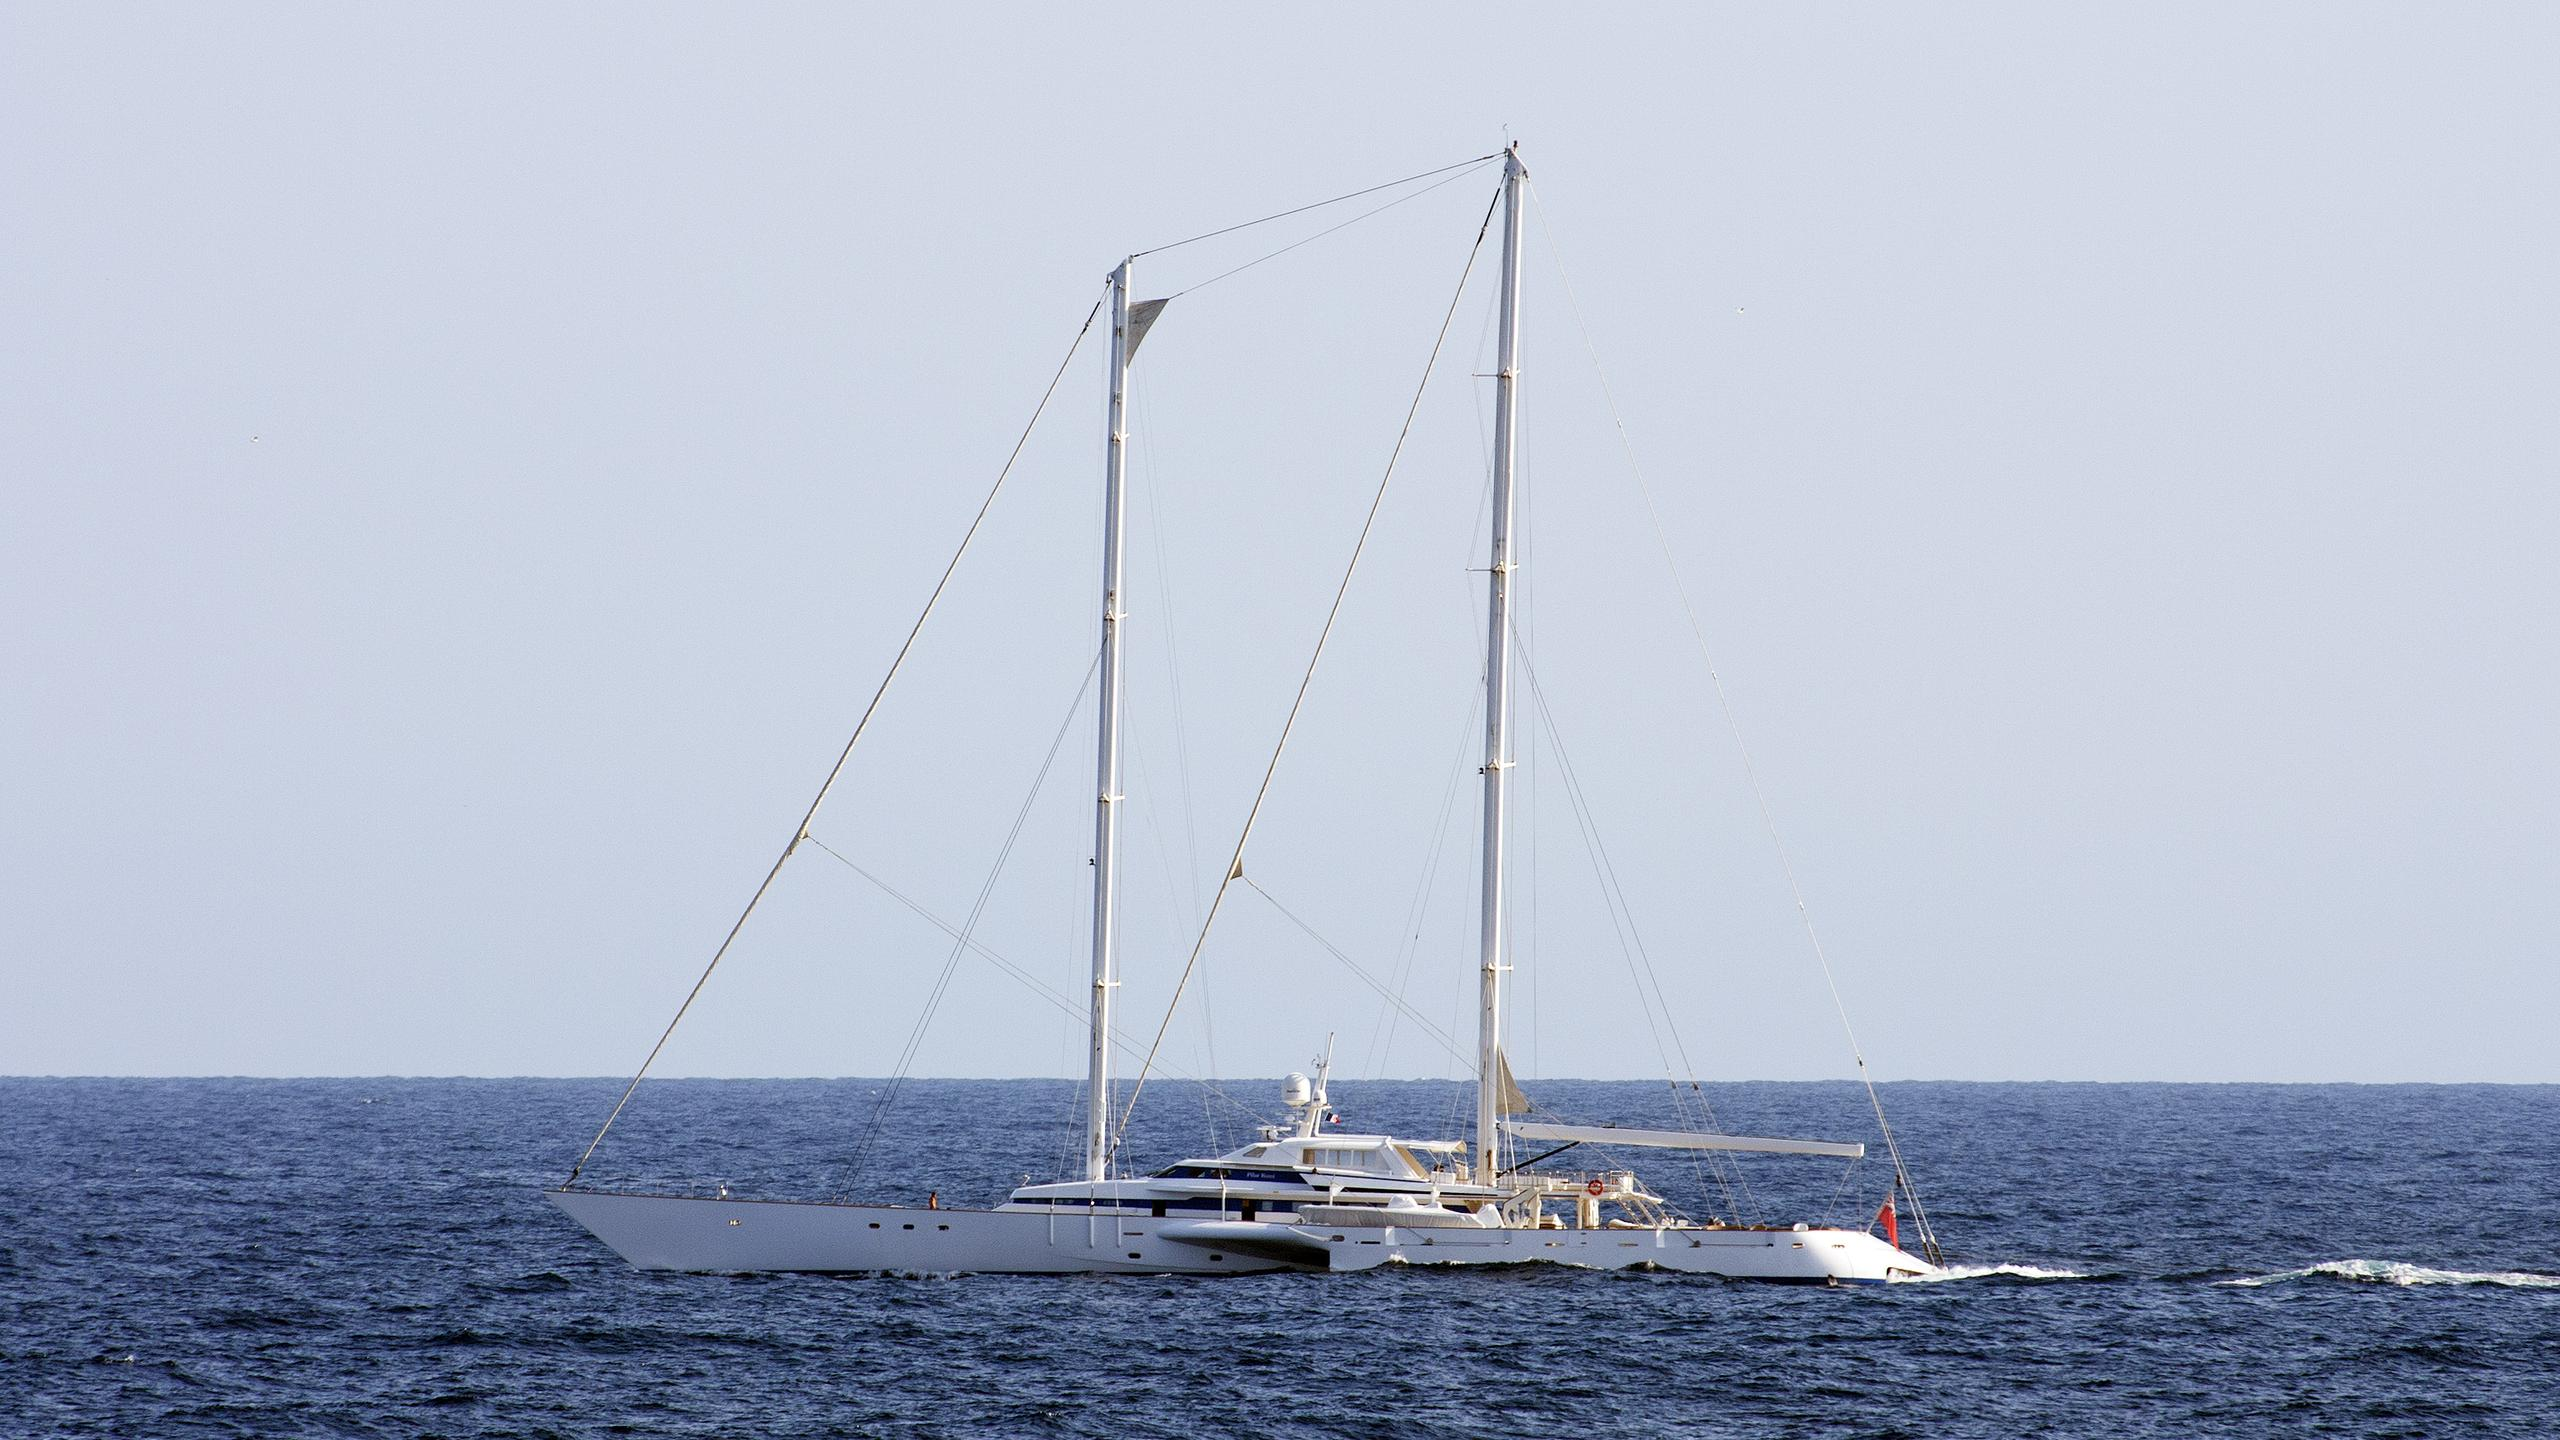 pilar-rossi-sailing-yacht-alukraft-1989-64m-profile